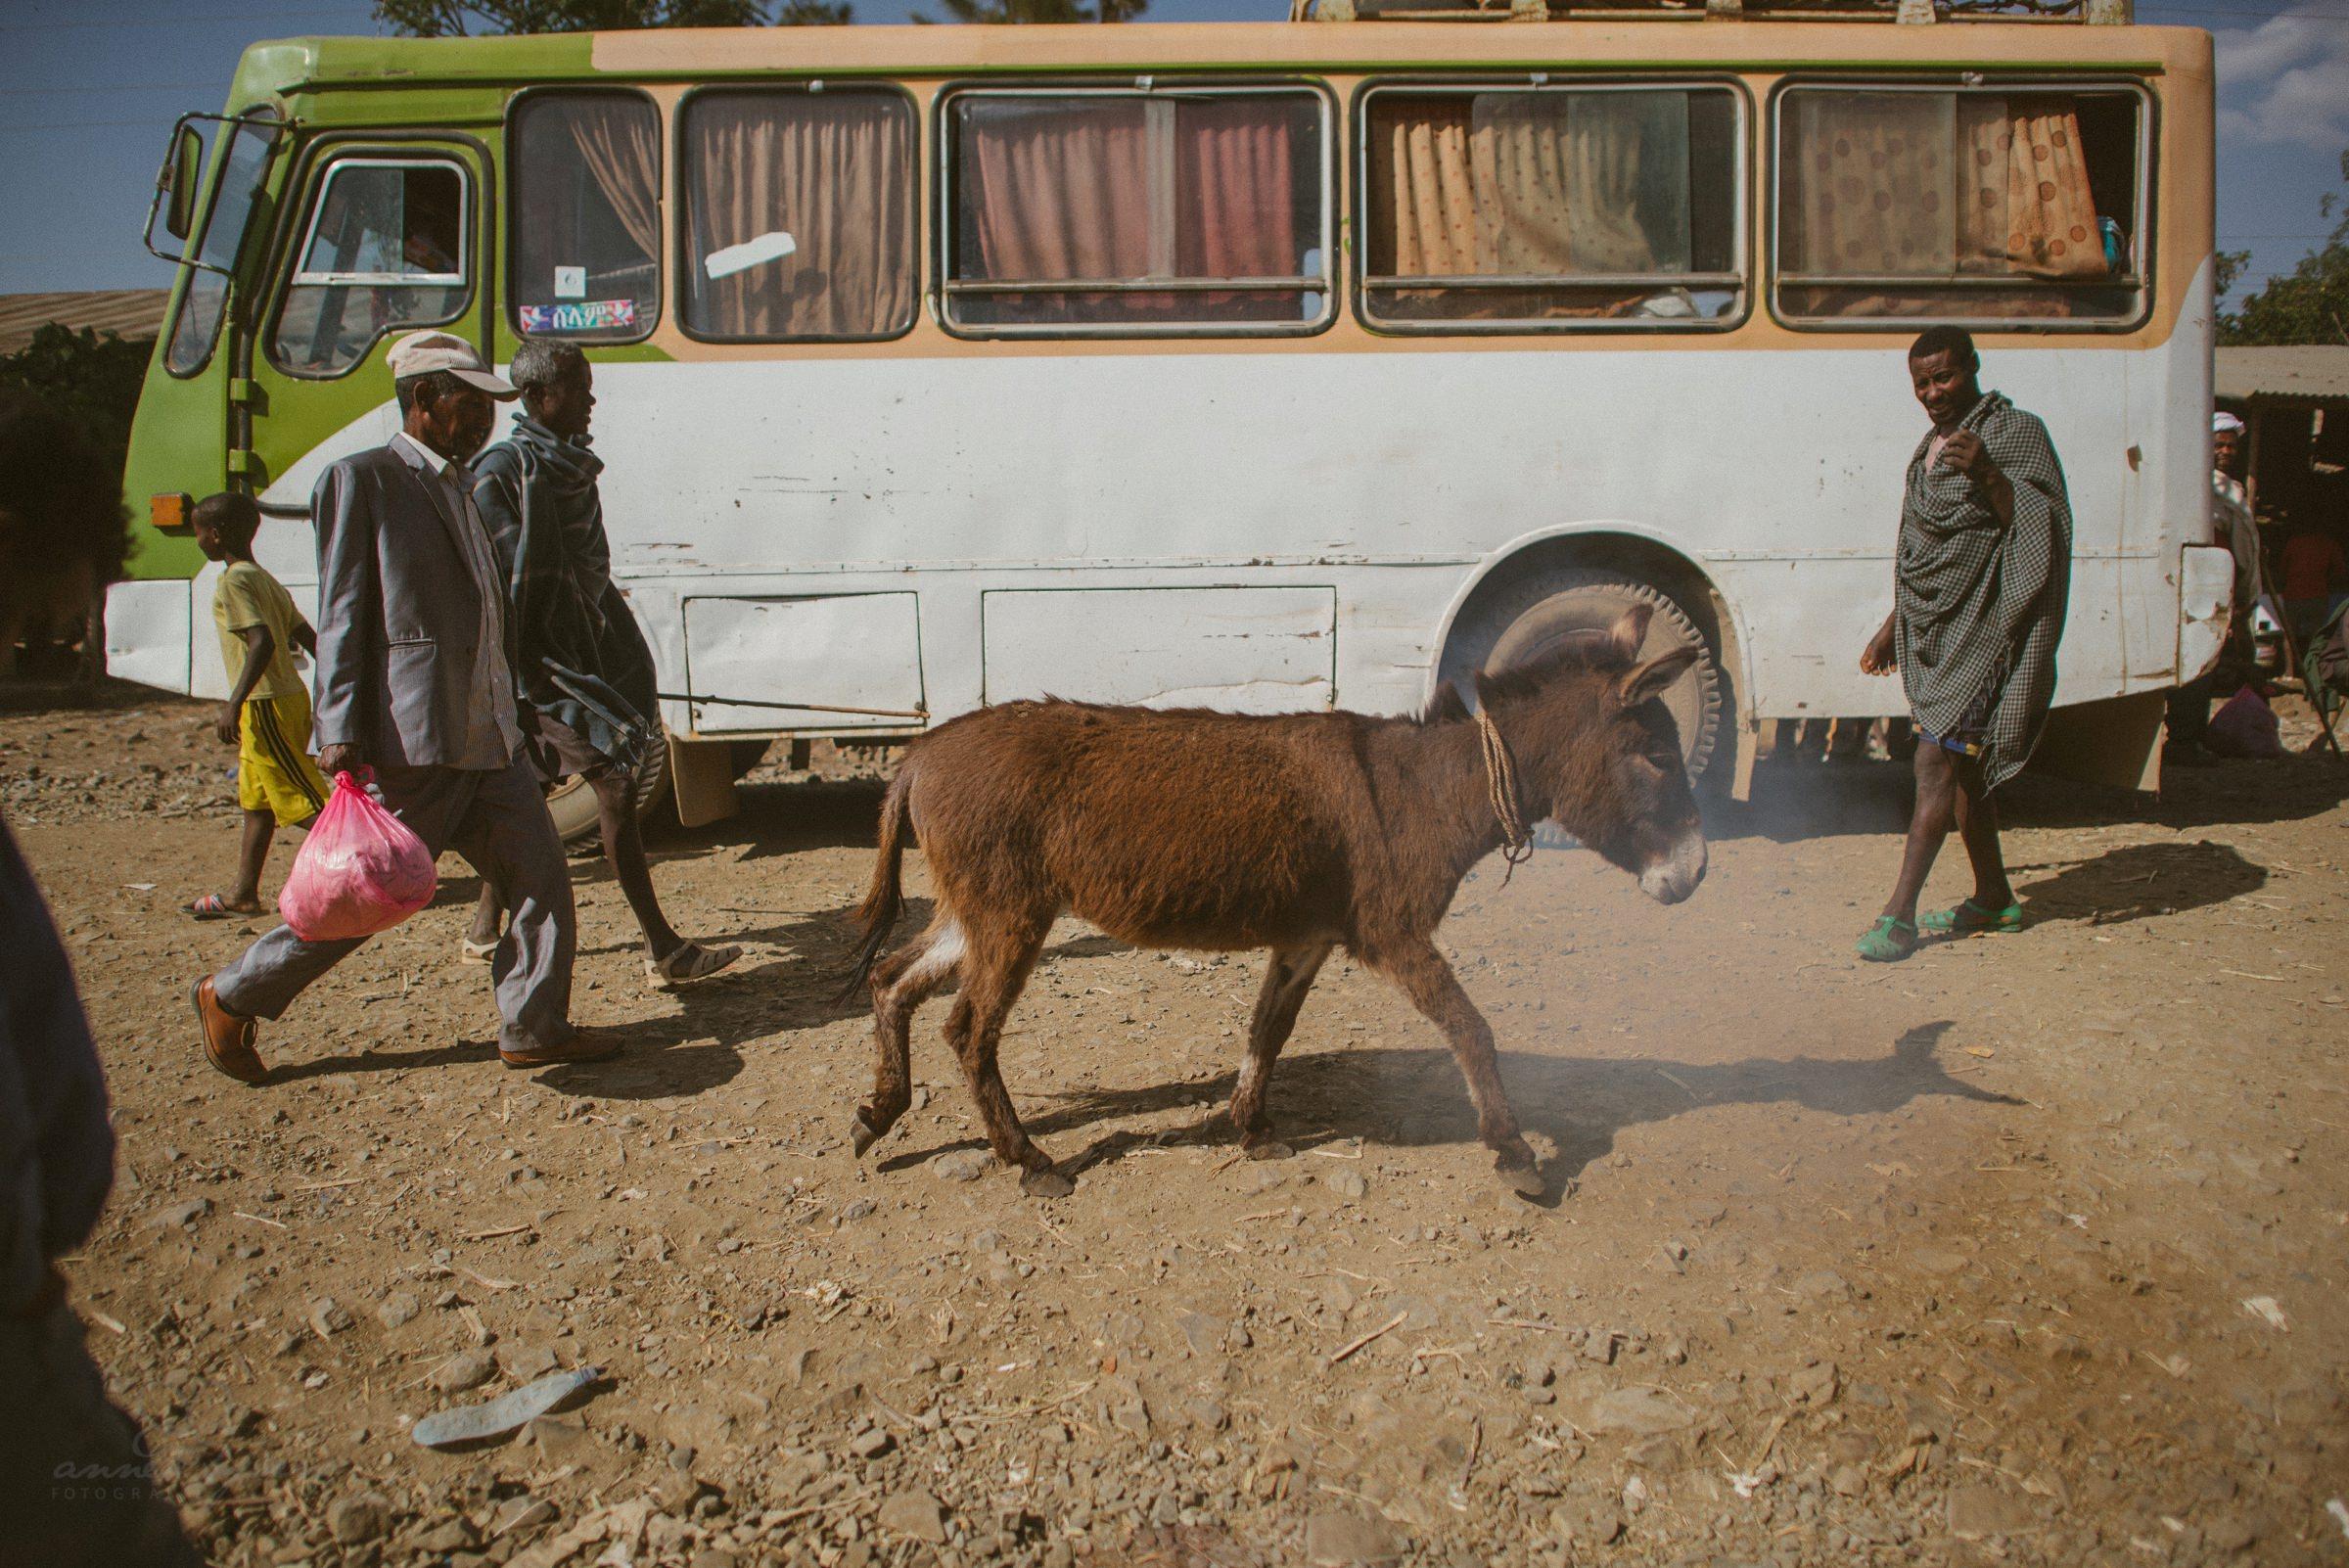 Esel, Streetphotography, Bus, Africa, Äthiopien